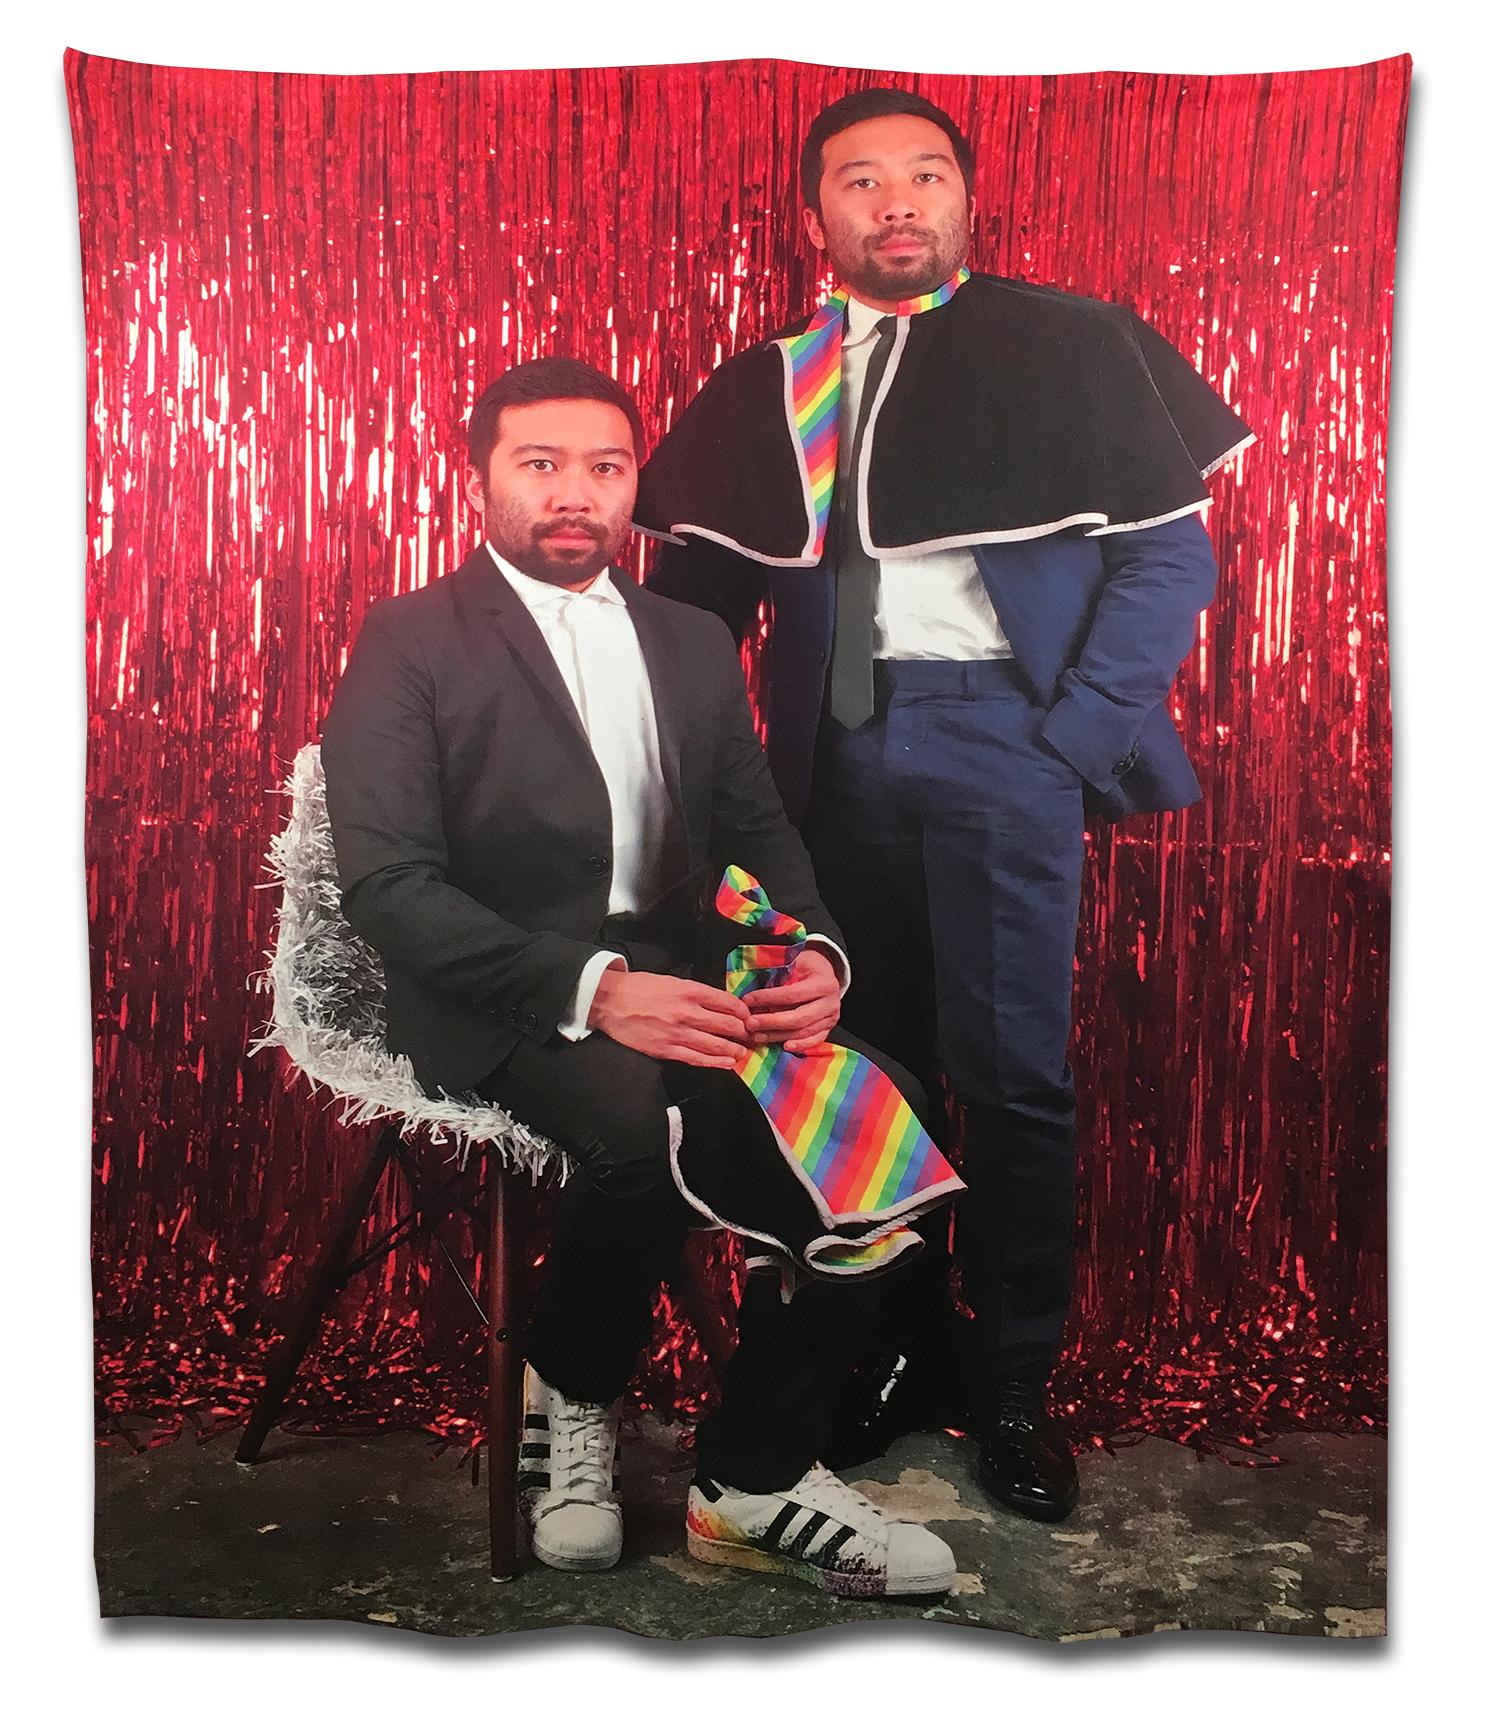 "photo booth (Andrew Ethan and Robert Zachary)  , 2018. Photo on fleece. 60"" x 50""."